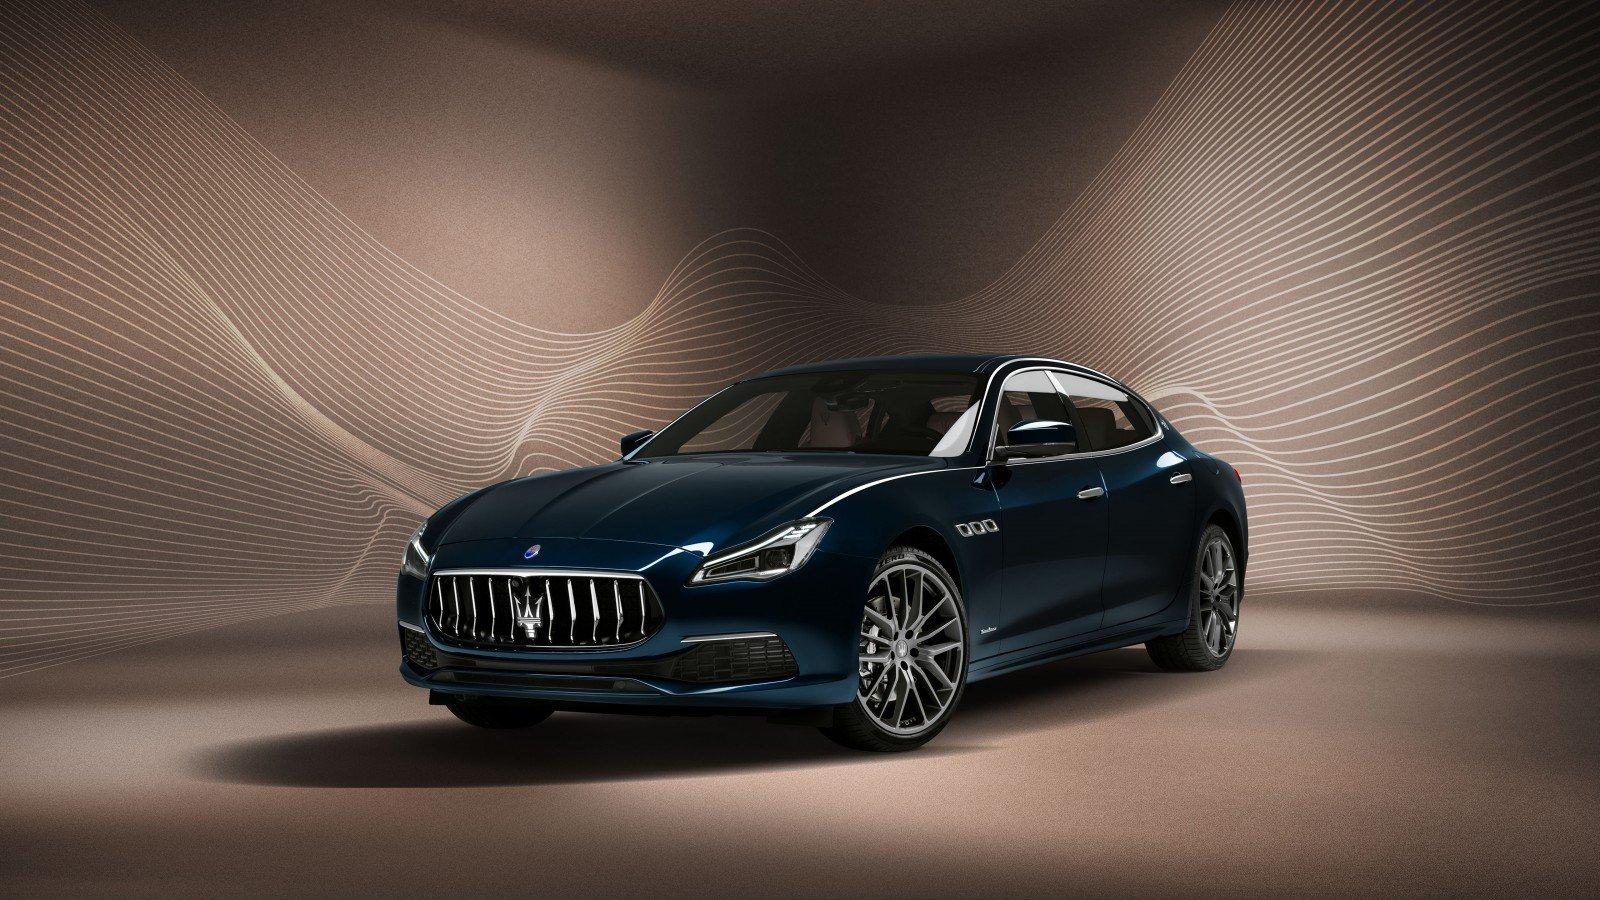 Maserati Quattroporte GranLusso Royale 2020 5K Wallpaper HD Car 1600x900